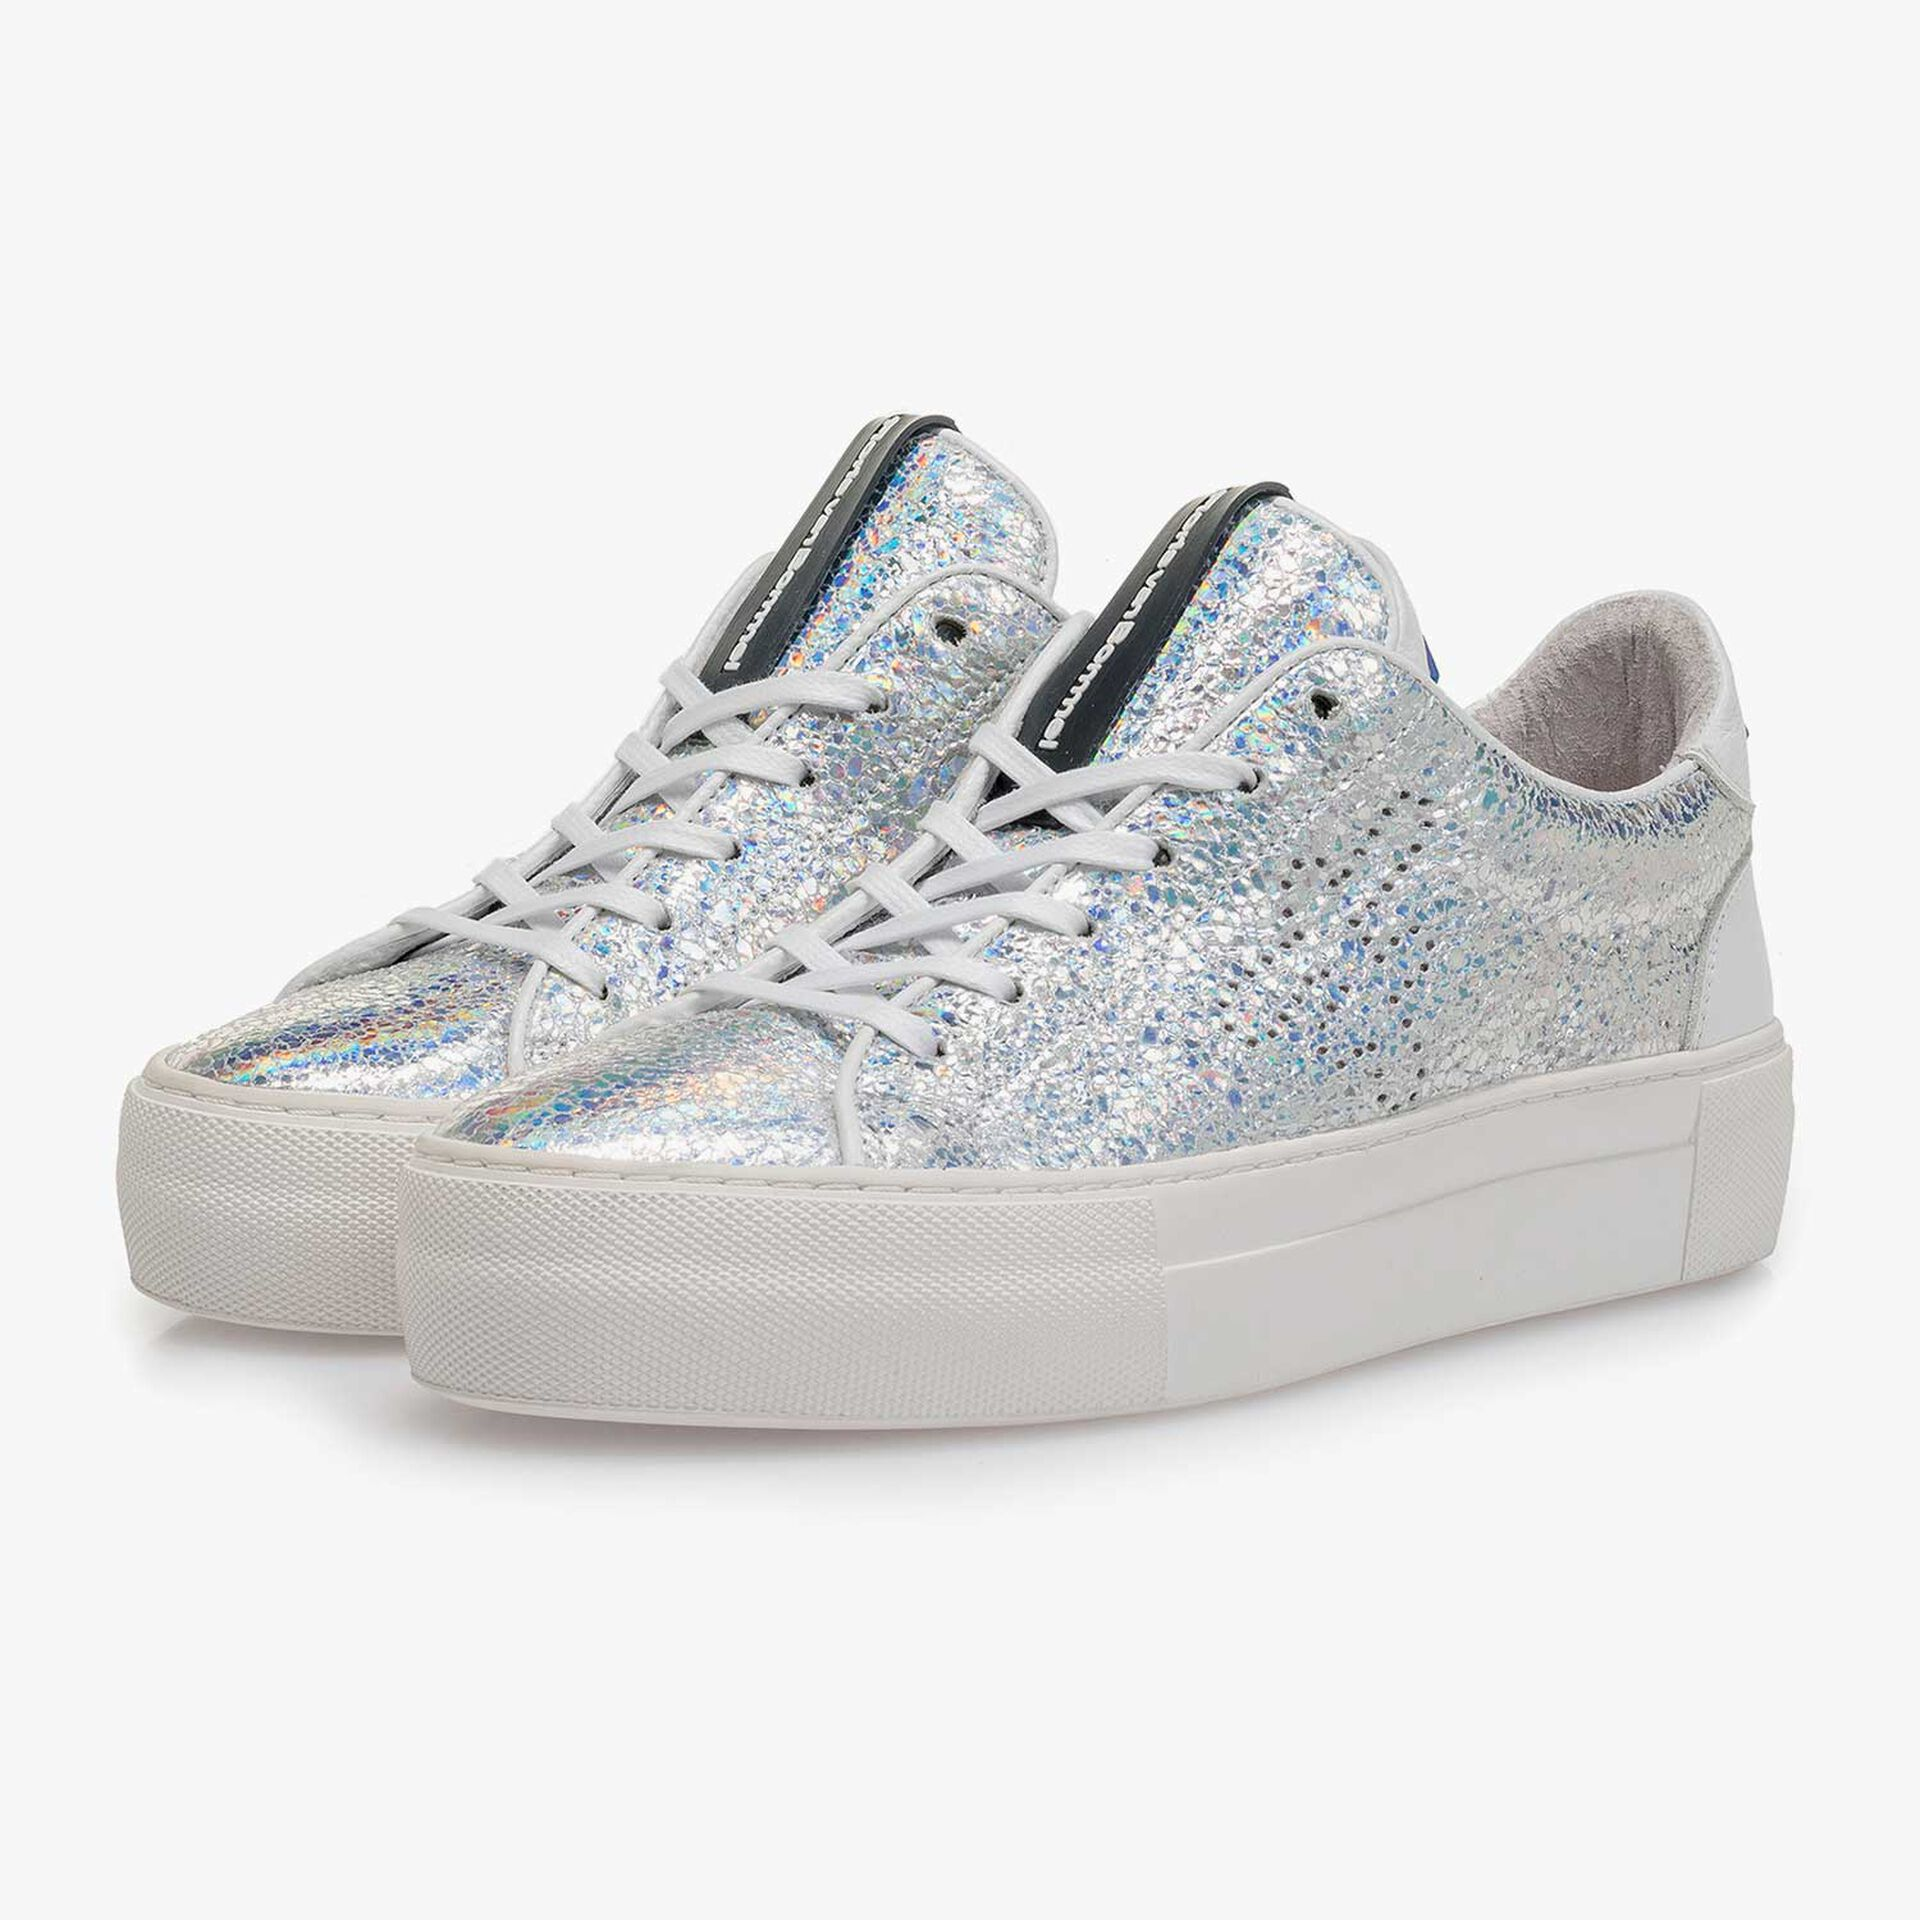 Silber Metallic Leder-Sneaker mit Craquelé-Effekt